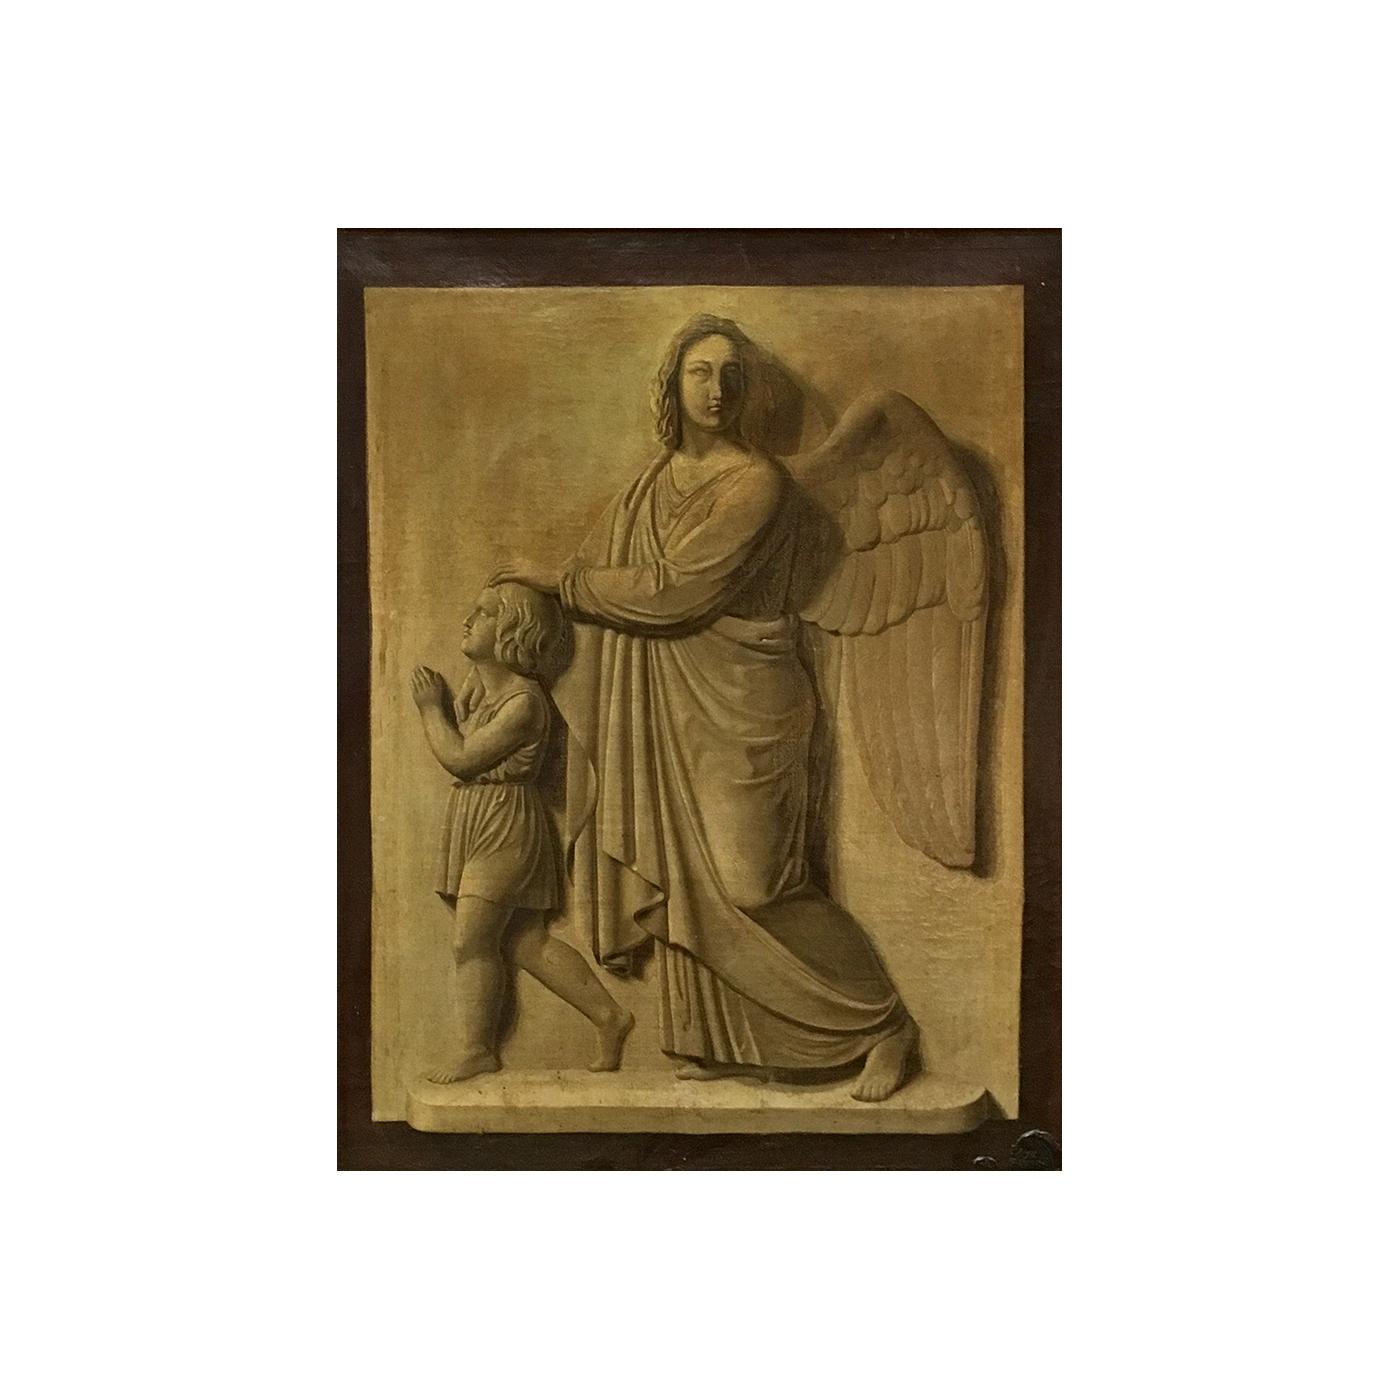 "Danish School ""Plaster cast painting of the Archangel Gabriel and figure"", ca.1870s"